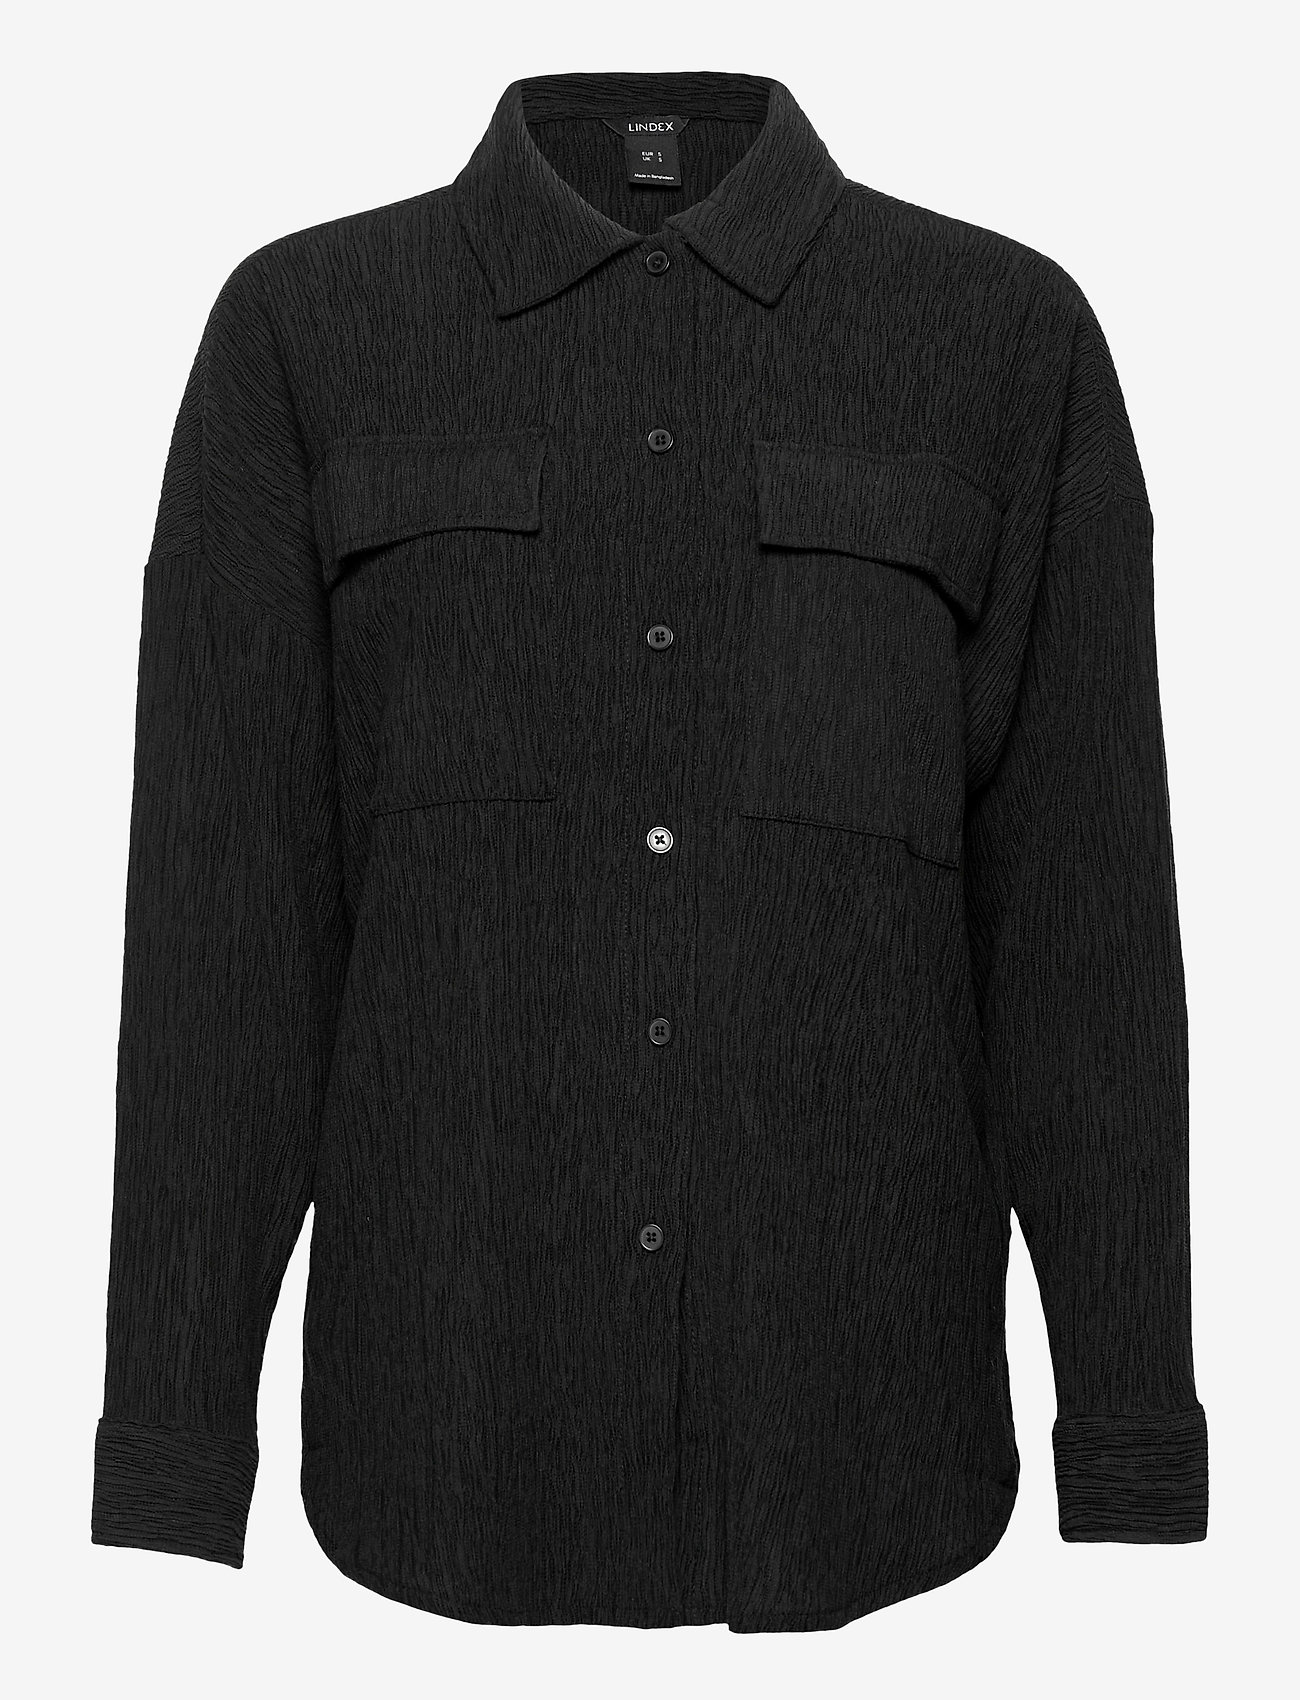 Lindex - Corinne Shacket Plisse - vêtements - black - 0